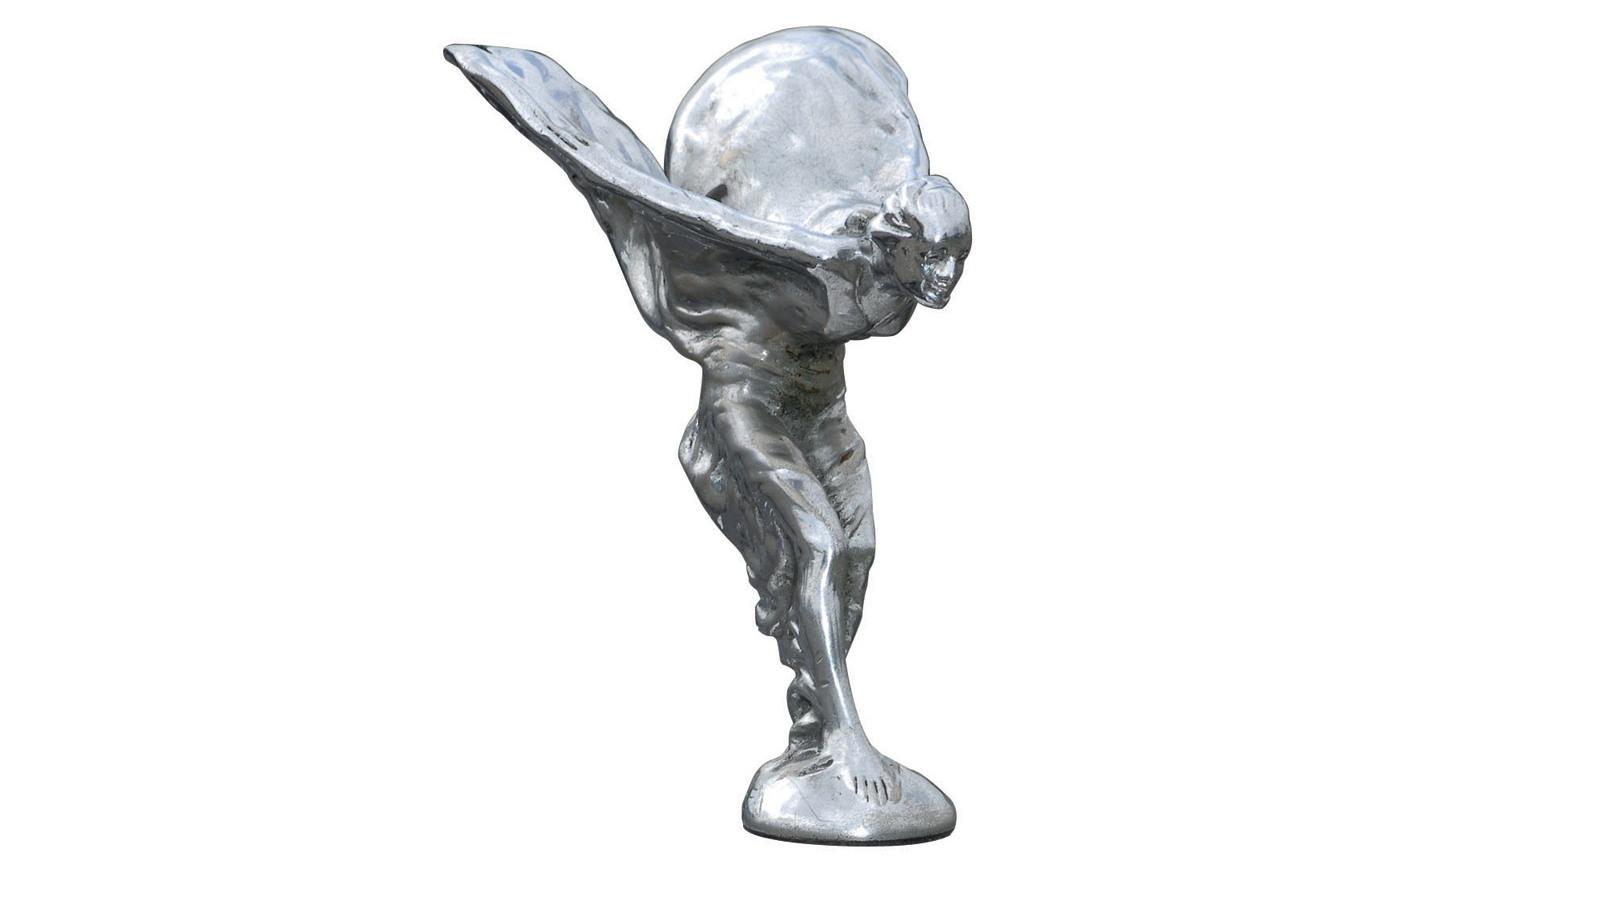 Spirit of Ecstasy mascot